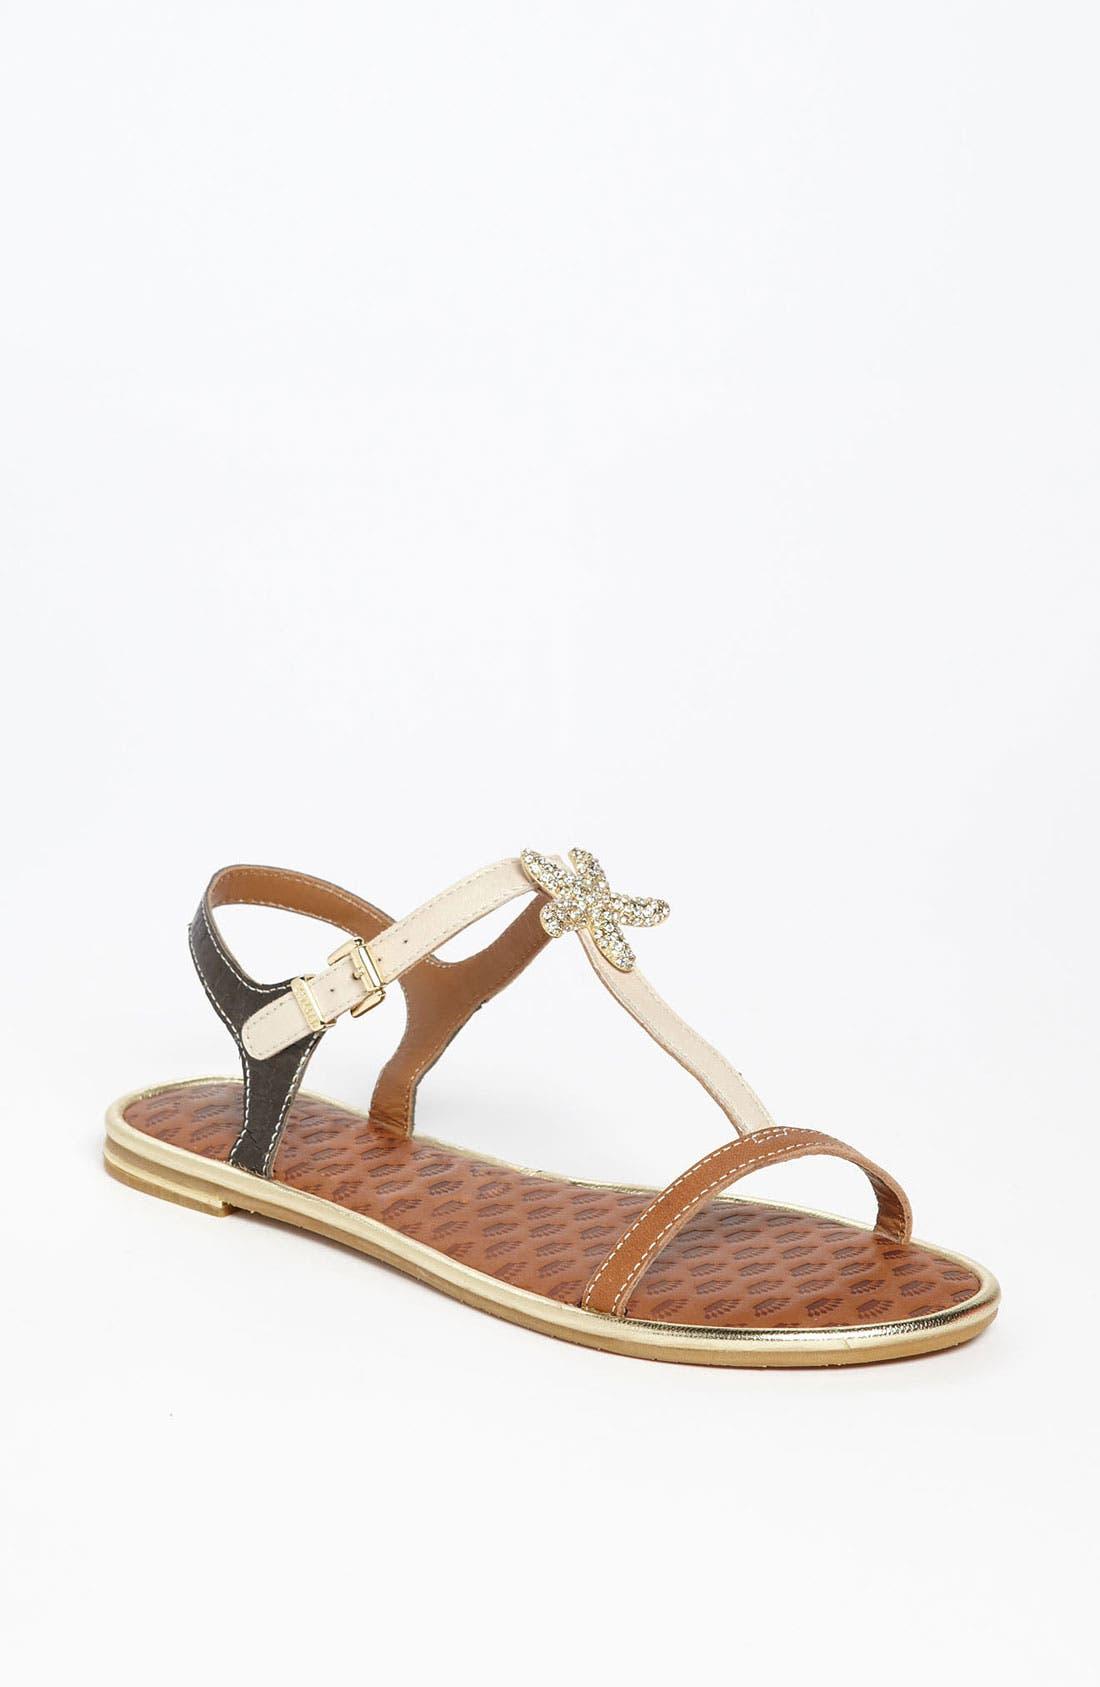 Main Image - Juicy Couture 'Alana' Sandal